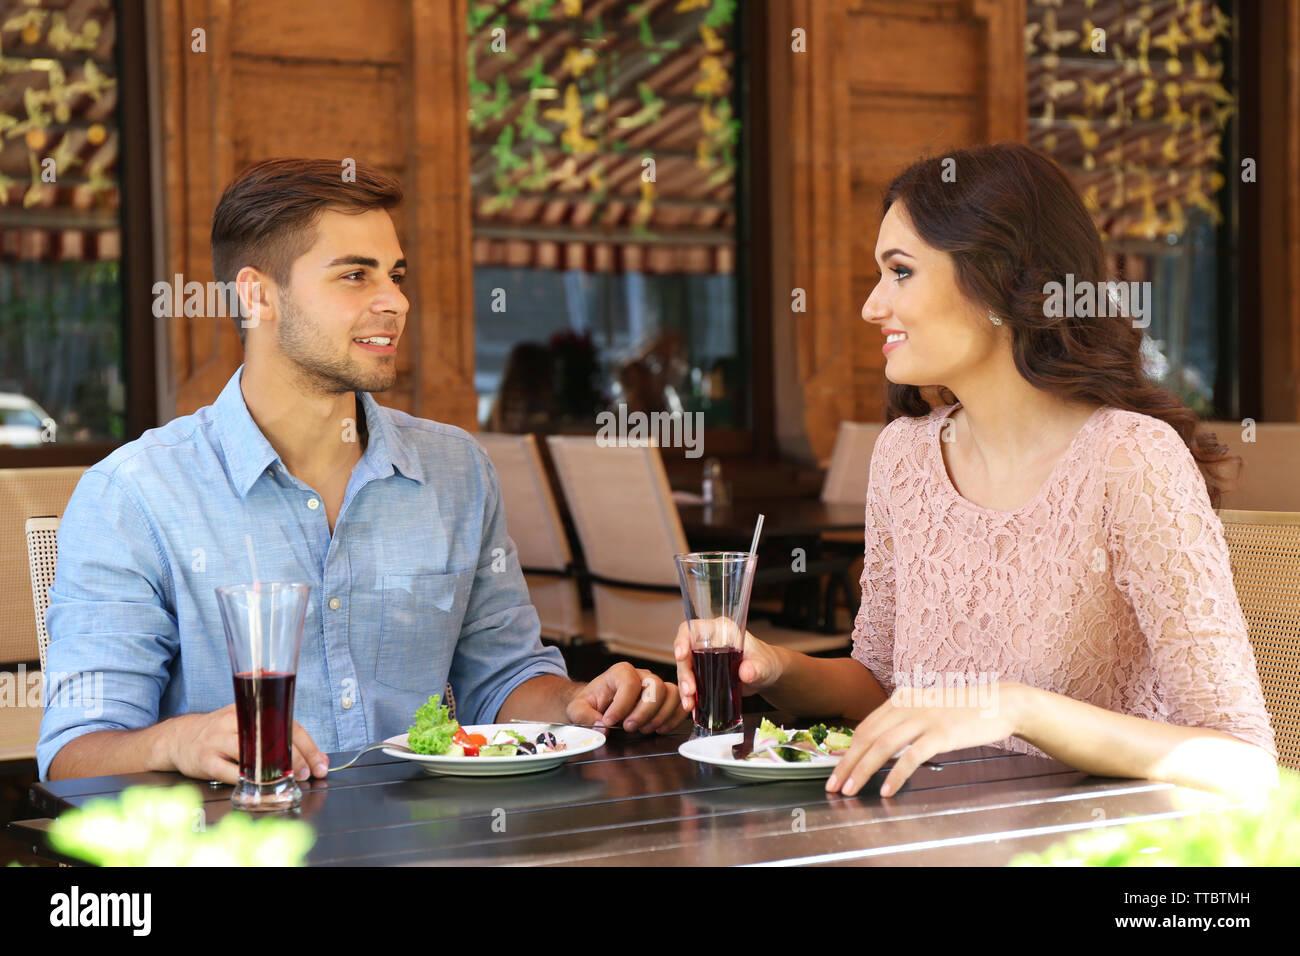 dating restaurant program homofile cop dating sites